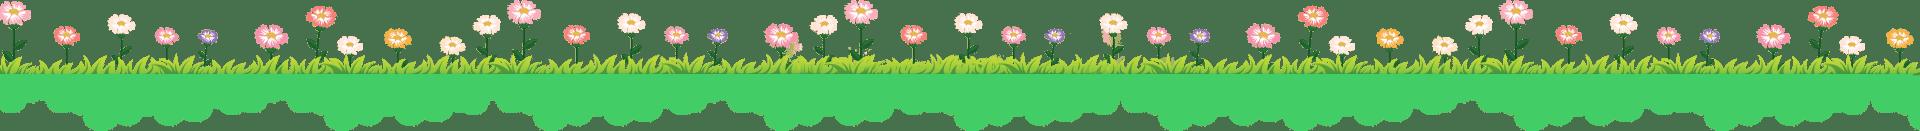 jardí amb flors